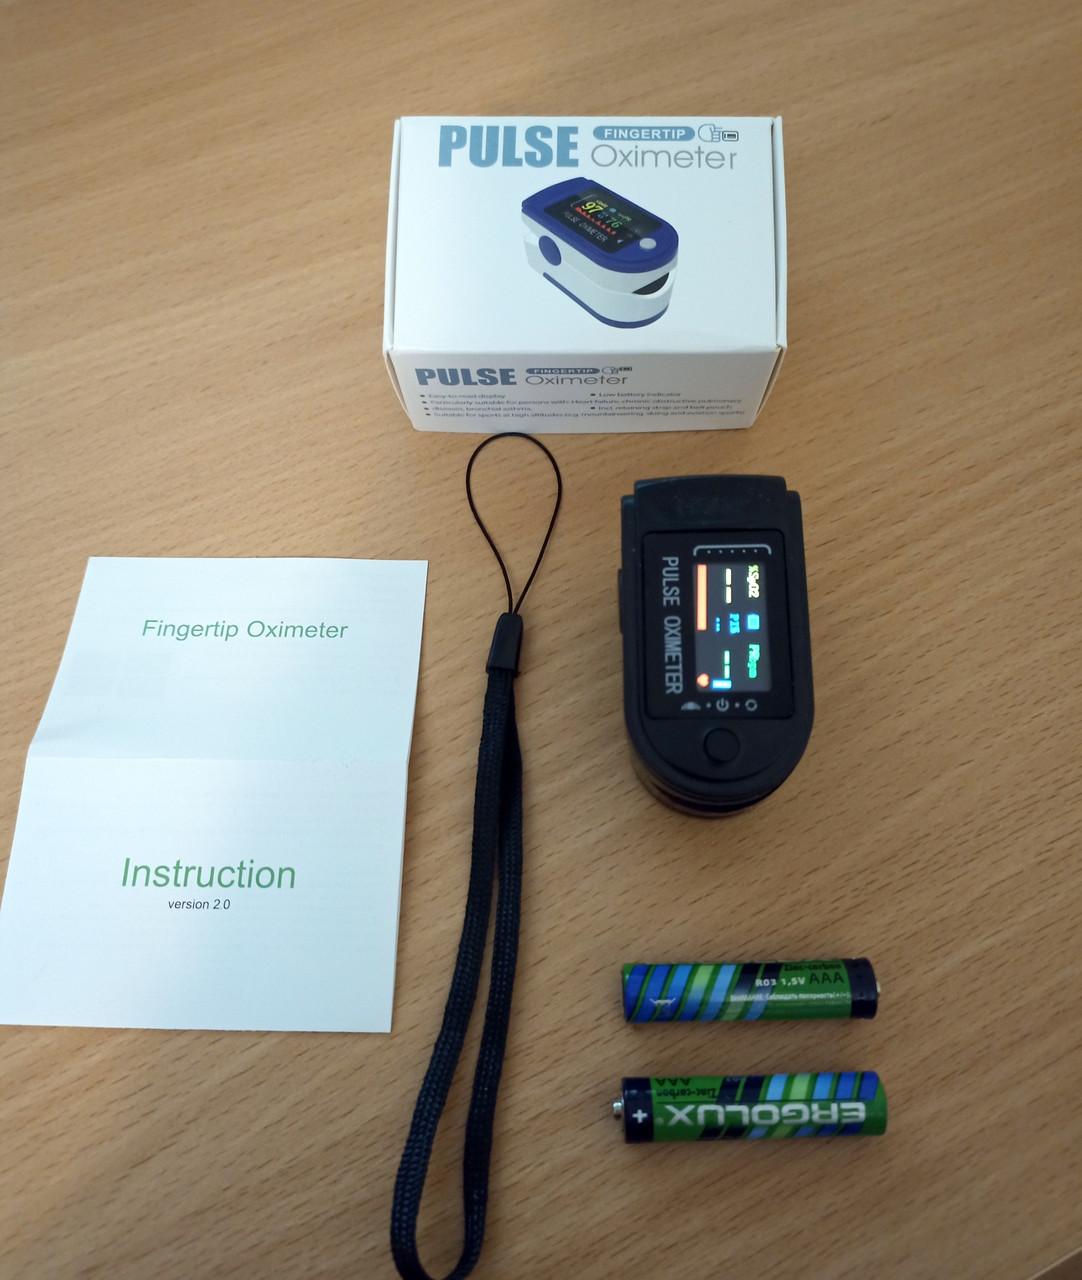 Пульсоксиметр Pulse Oximeter RL42 пульсометр оксиметром